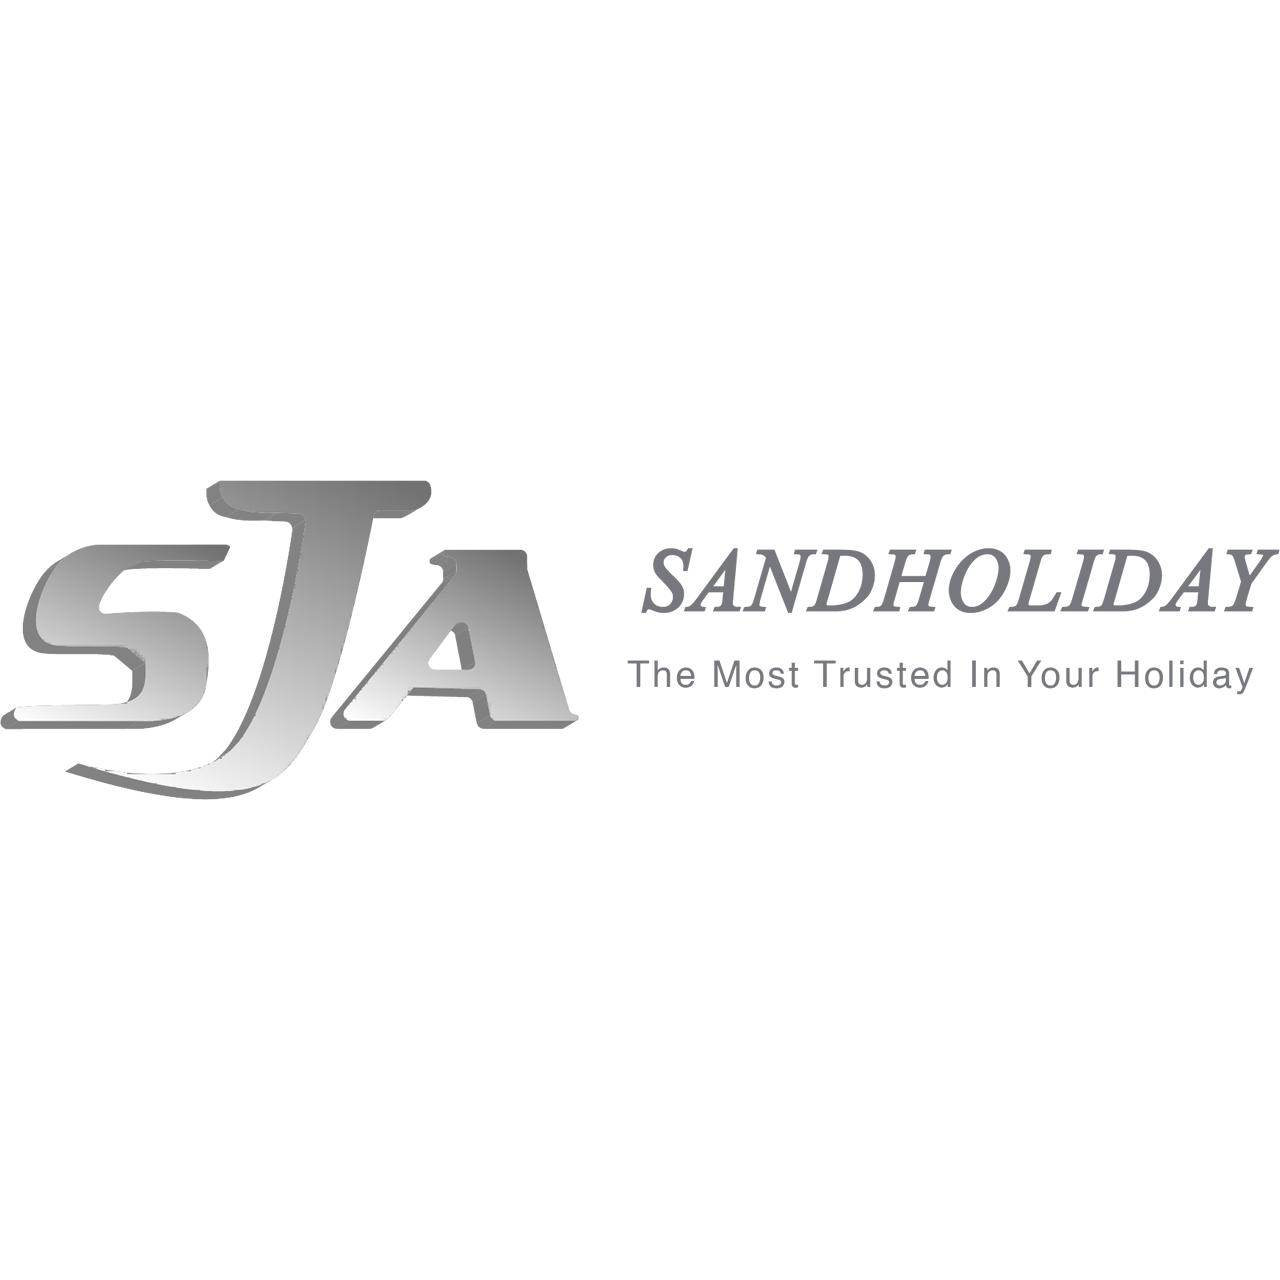 Sandholiday